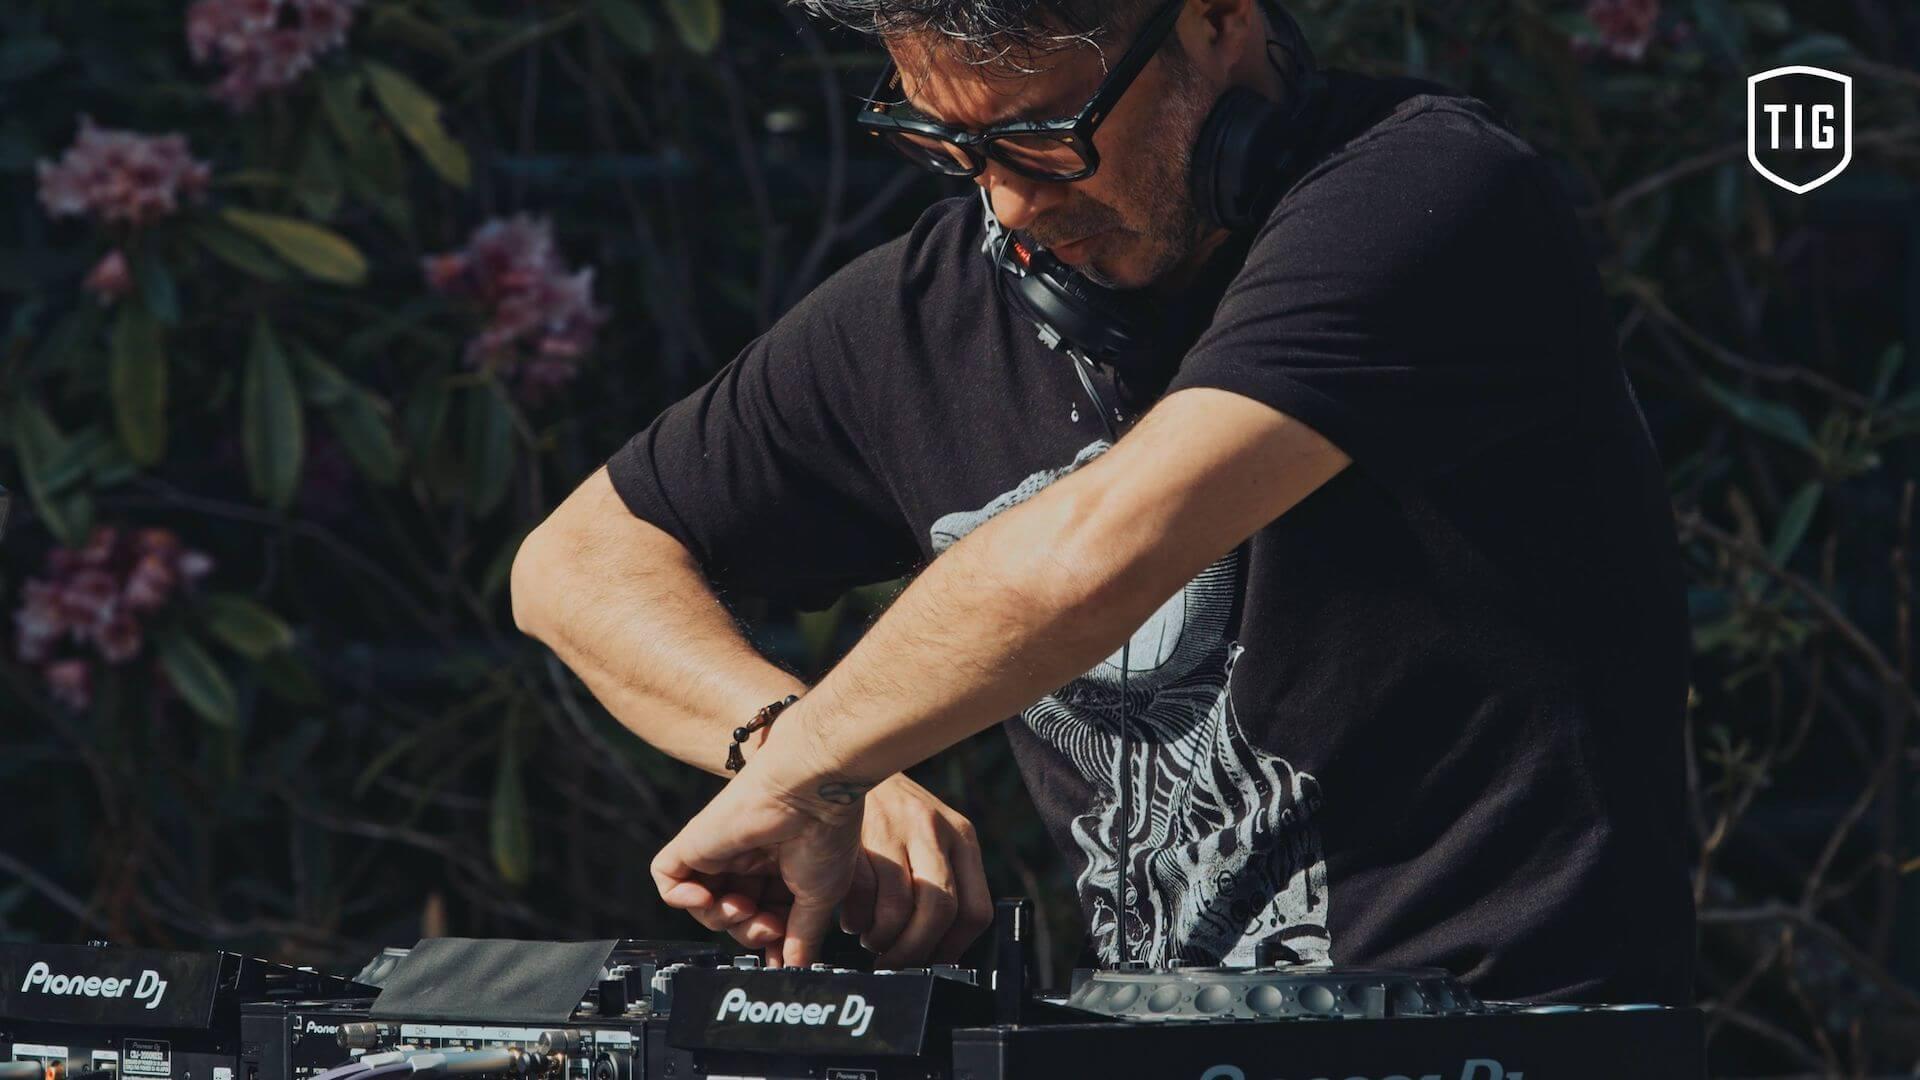 Tsuyoshi Suzukiが高野山金剛三昧院でDJを披露する「密教トランス」映像が公開 music210730-tsuyoshi-suzuki-6